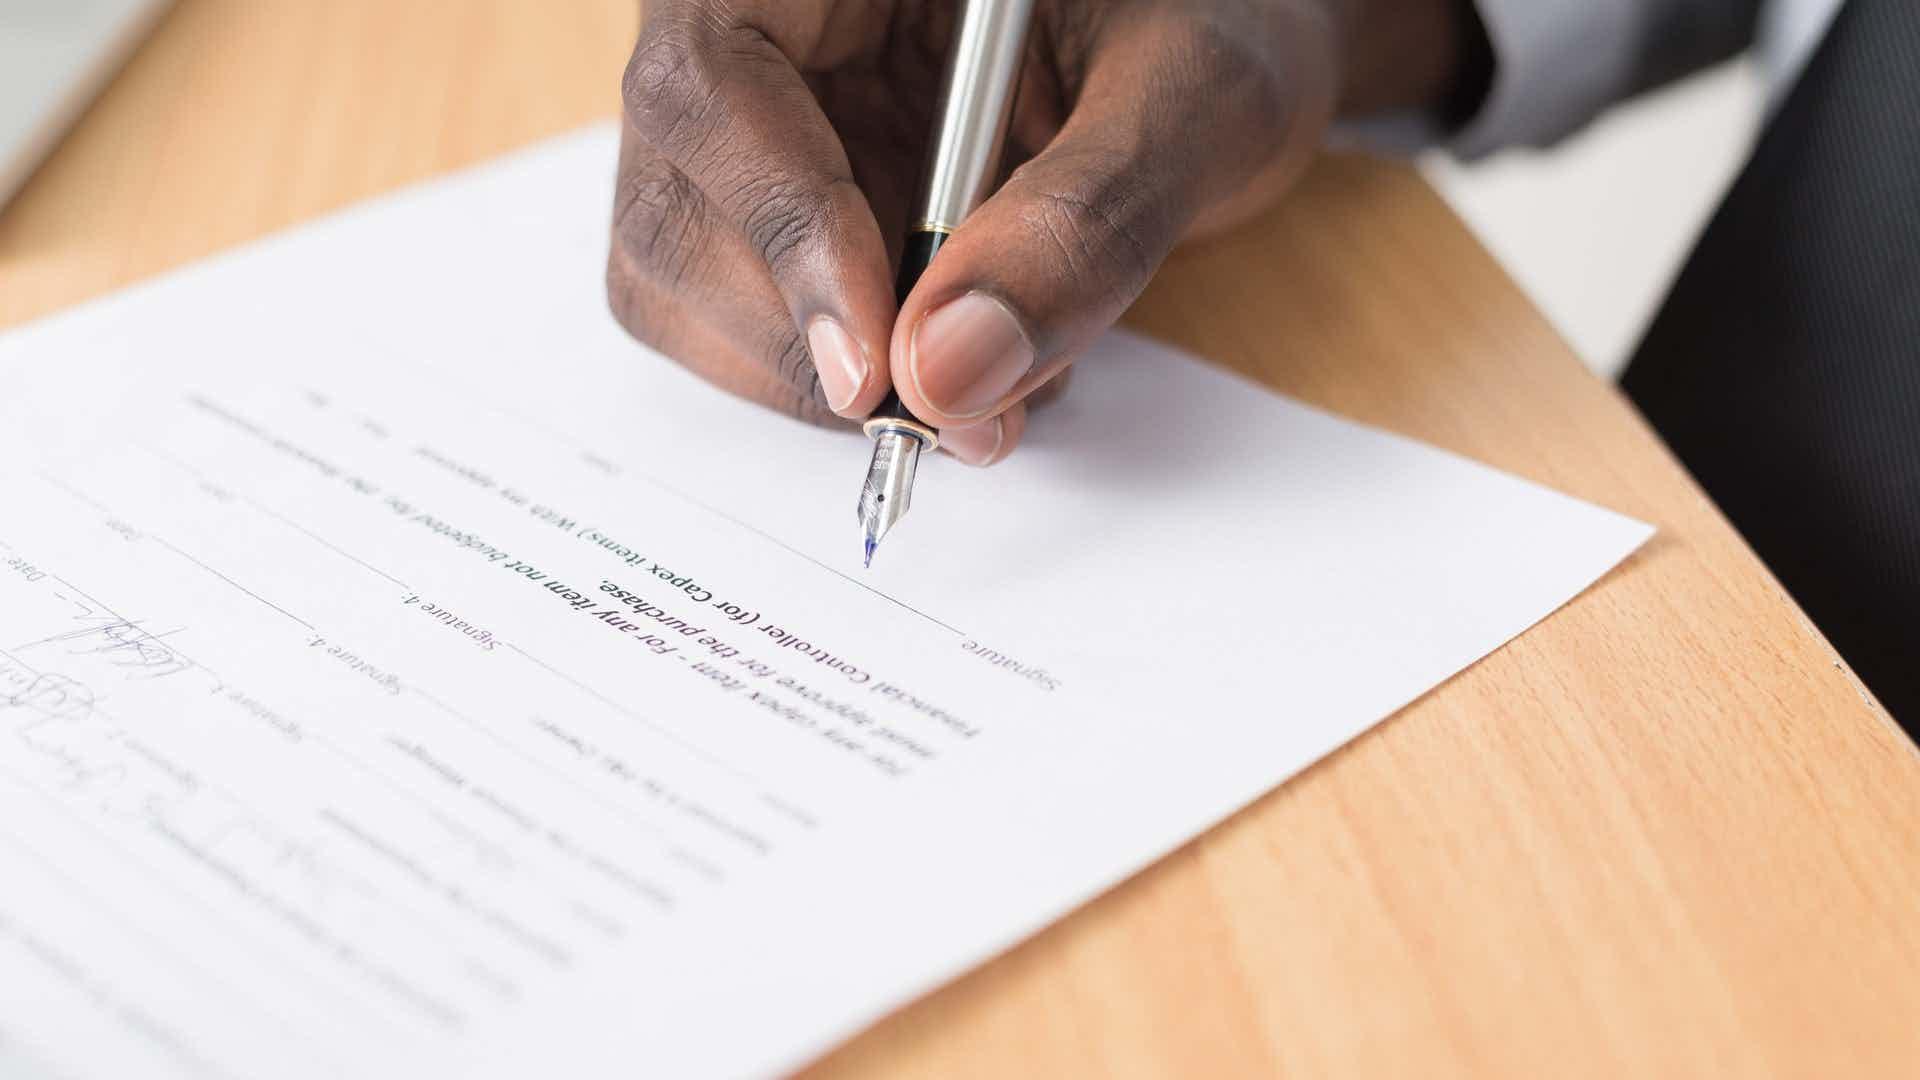 erfrecht testamen advocaat gezocht